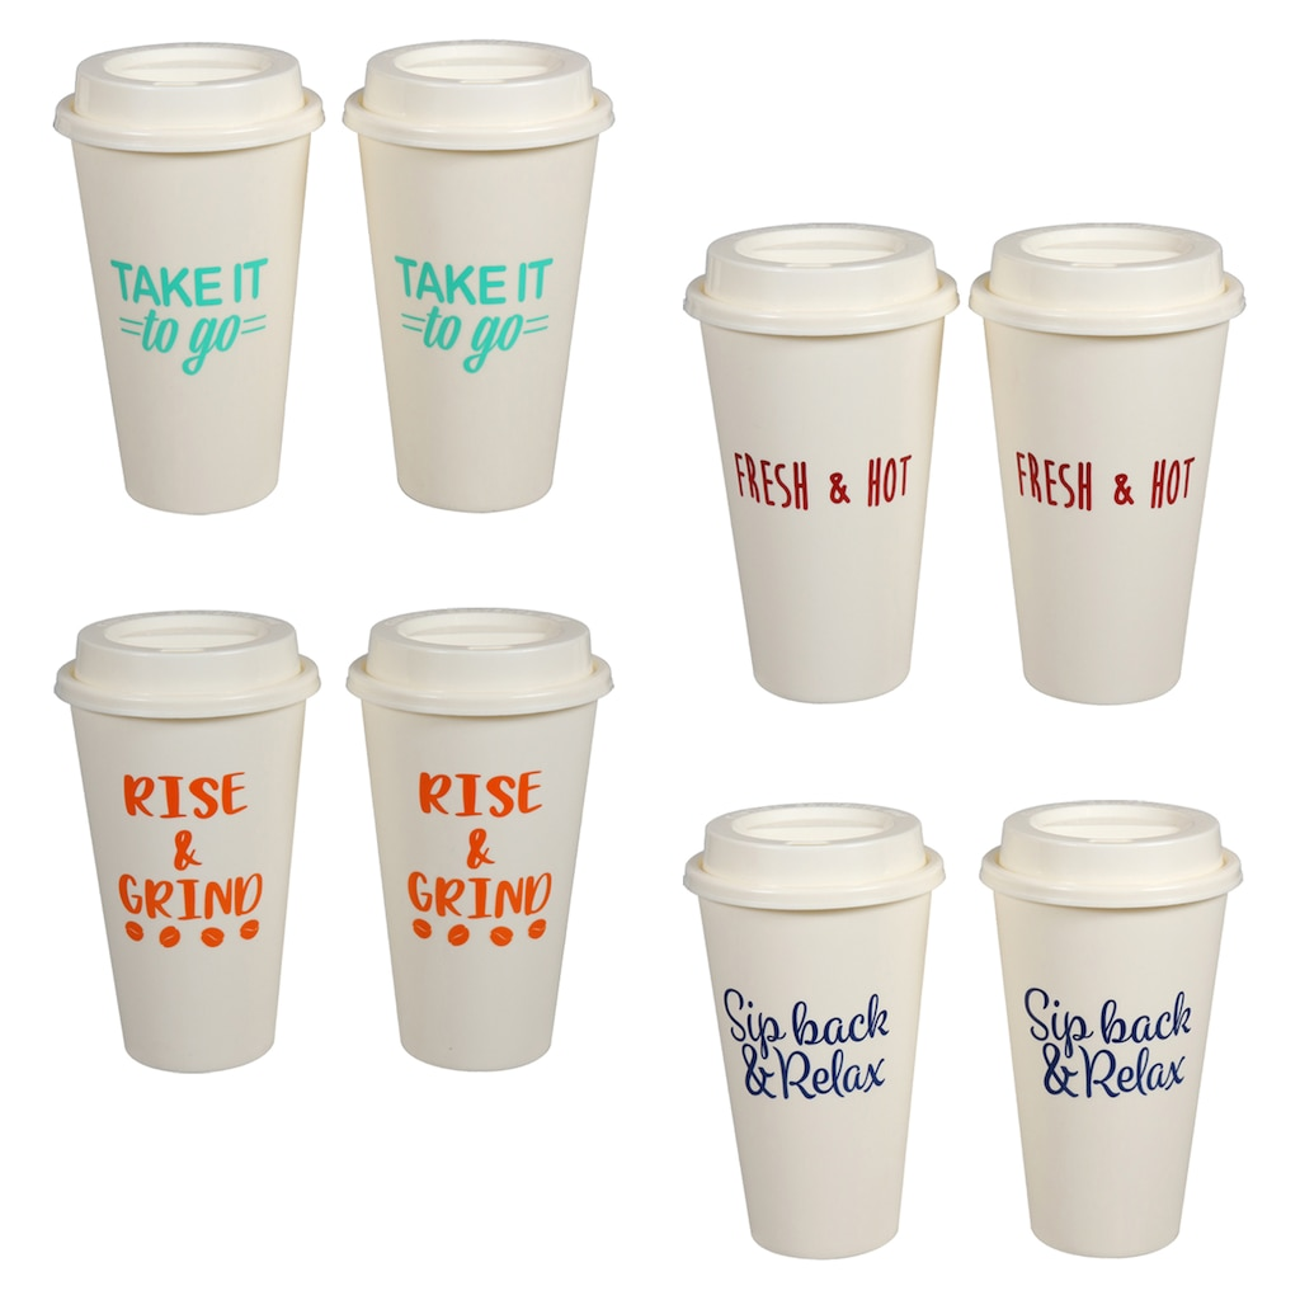 5b6b6cda54b Reusable Plastic Coffee Cups with Lids, 2-ct. Packs